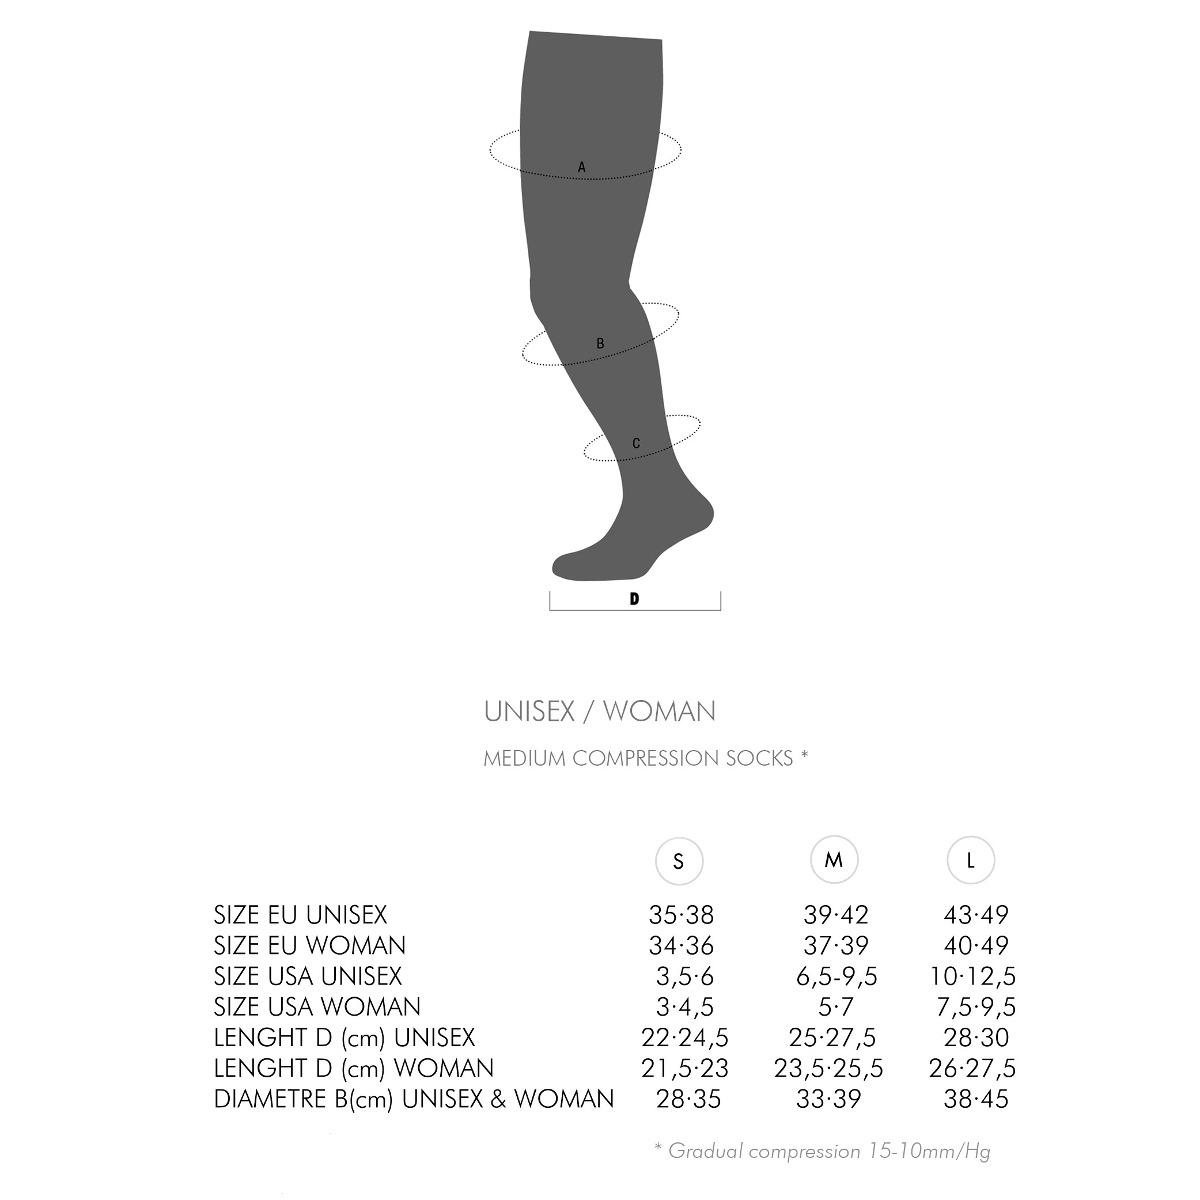 3ac5cd565cd Medias Calcetines De Compresion Trail Plus - Lurbel - $ 1.490,00 en ...